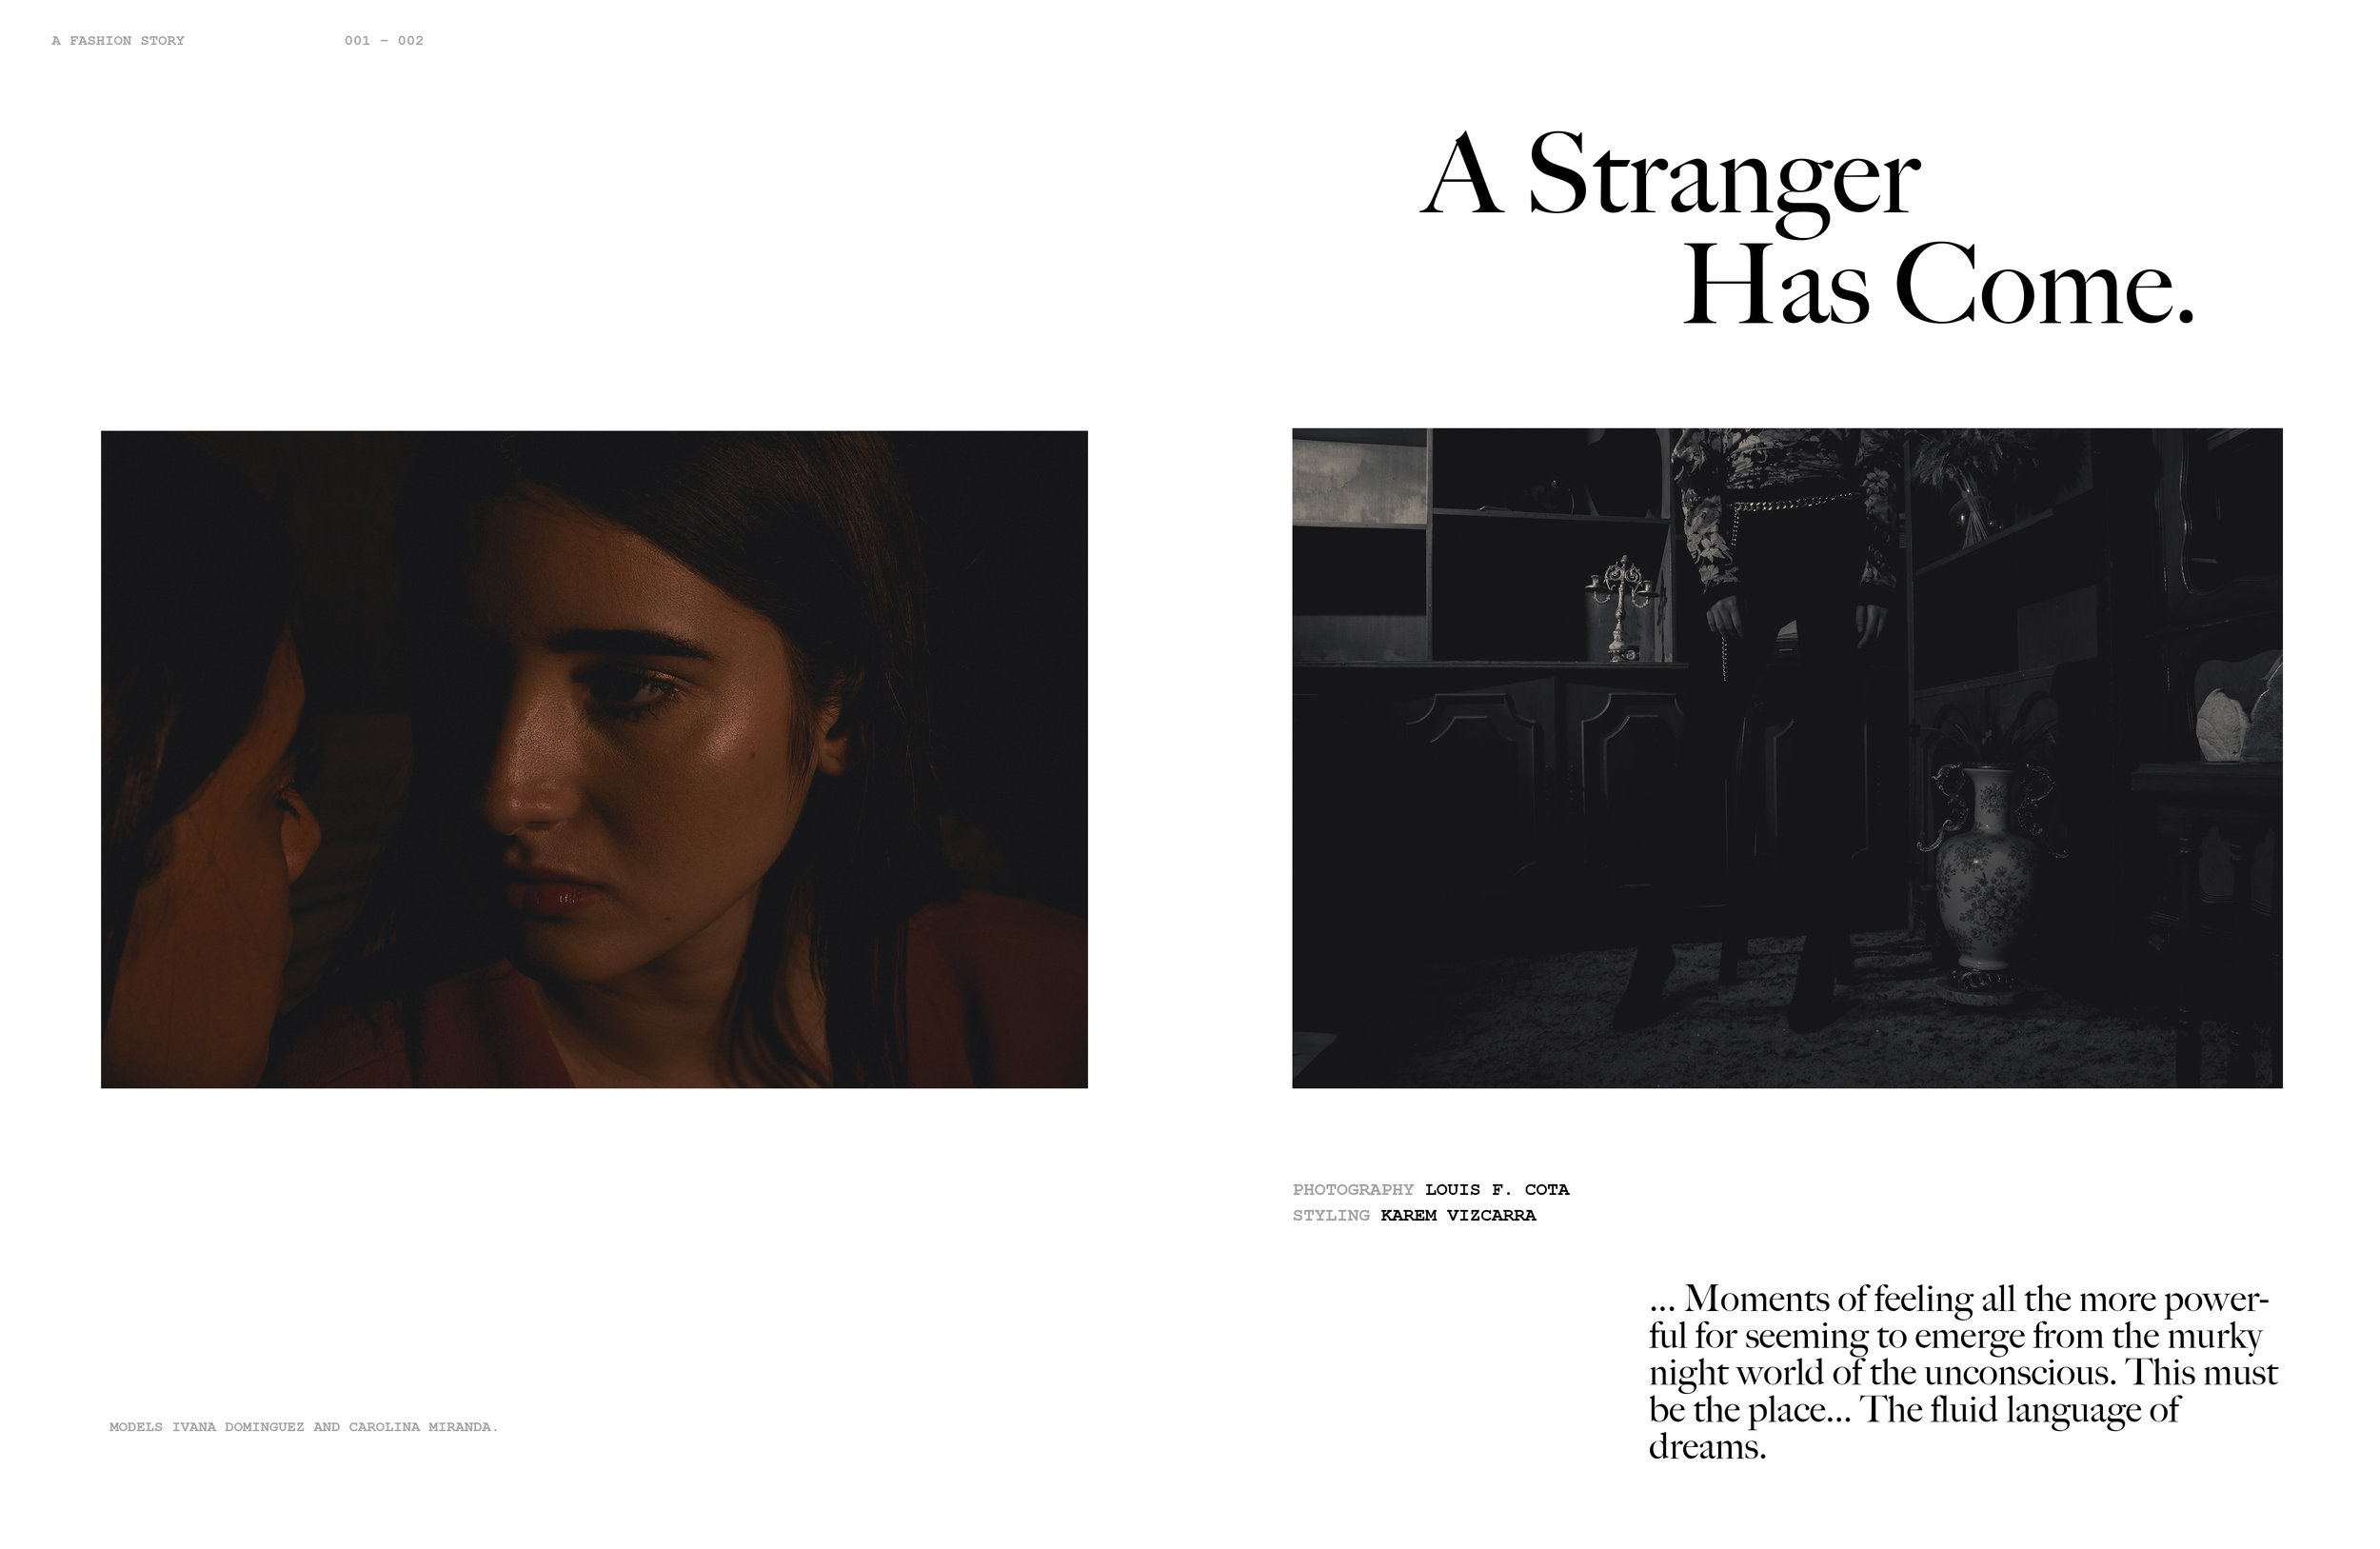 PAGE 001.jpg